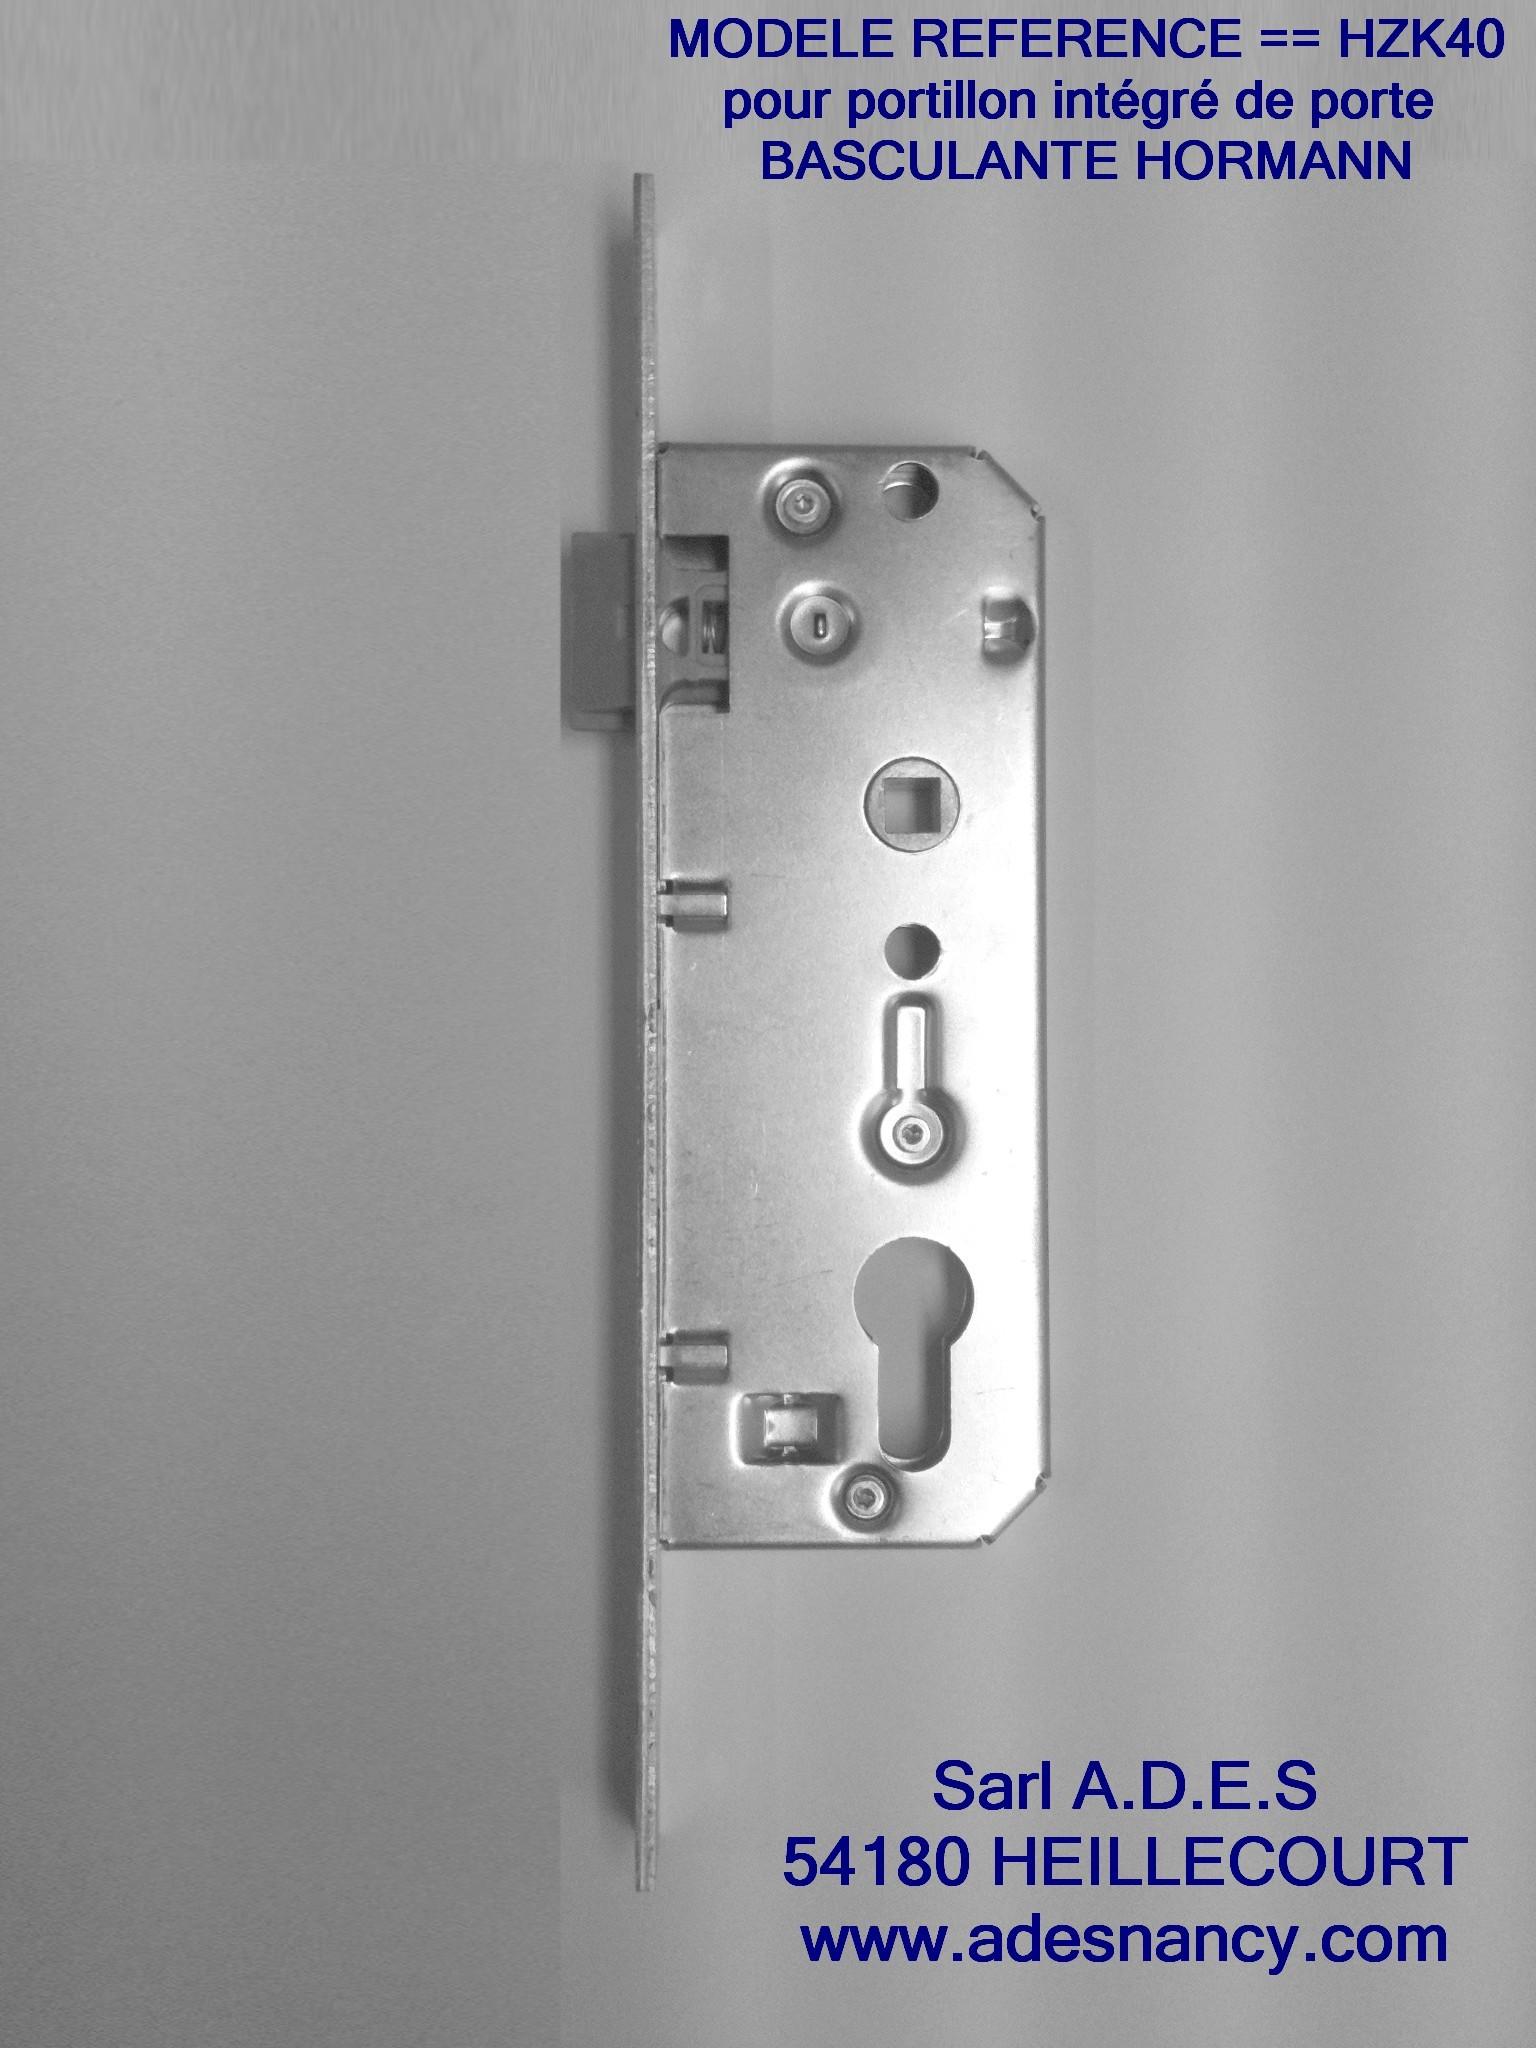 Serrure porte de garage basculante hormann excellent for Prix serrure porte de garage basculante